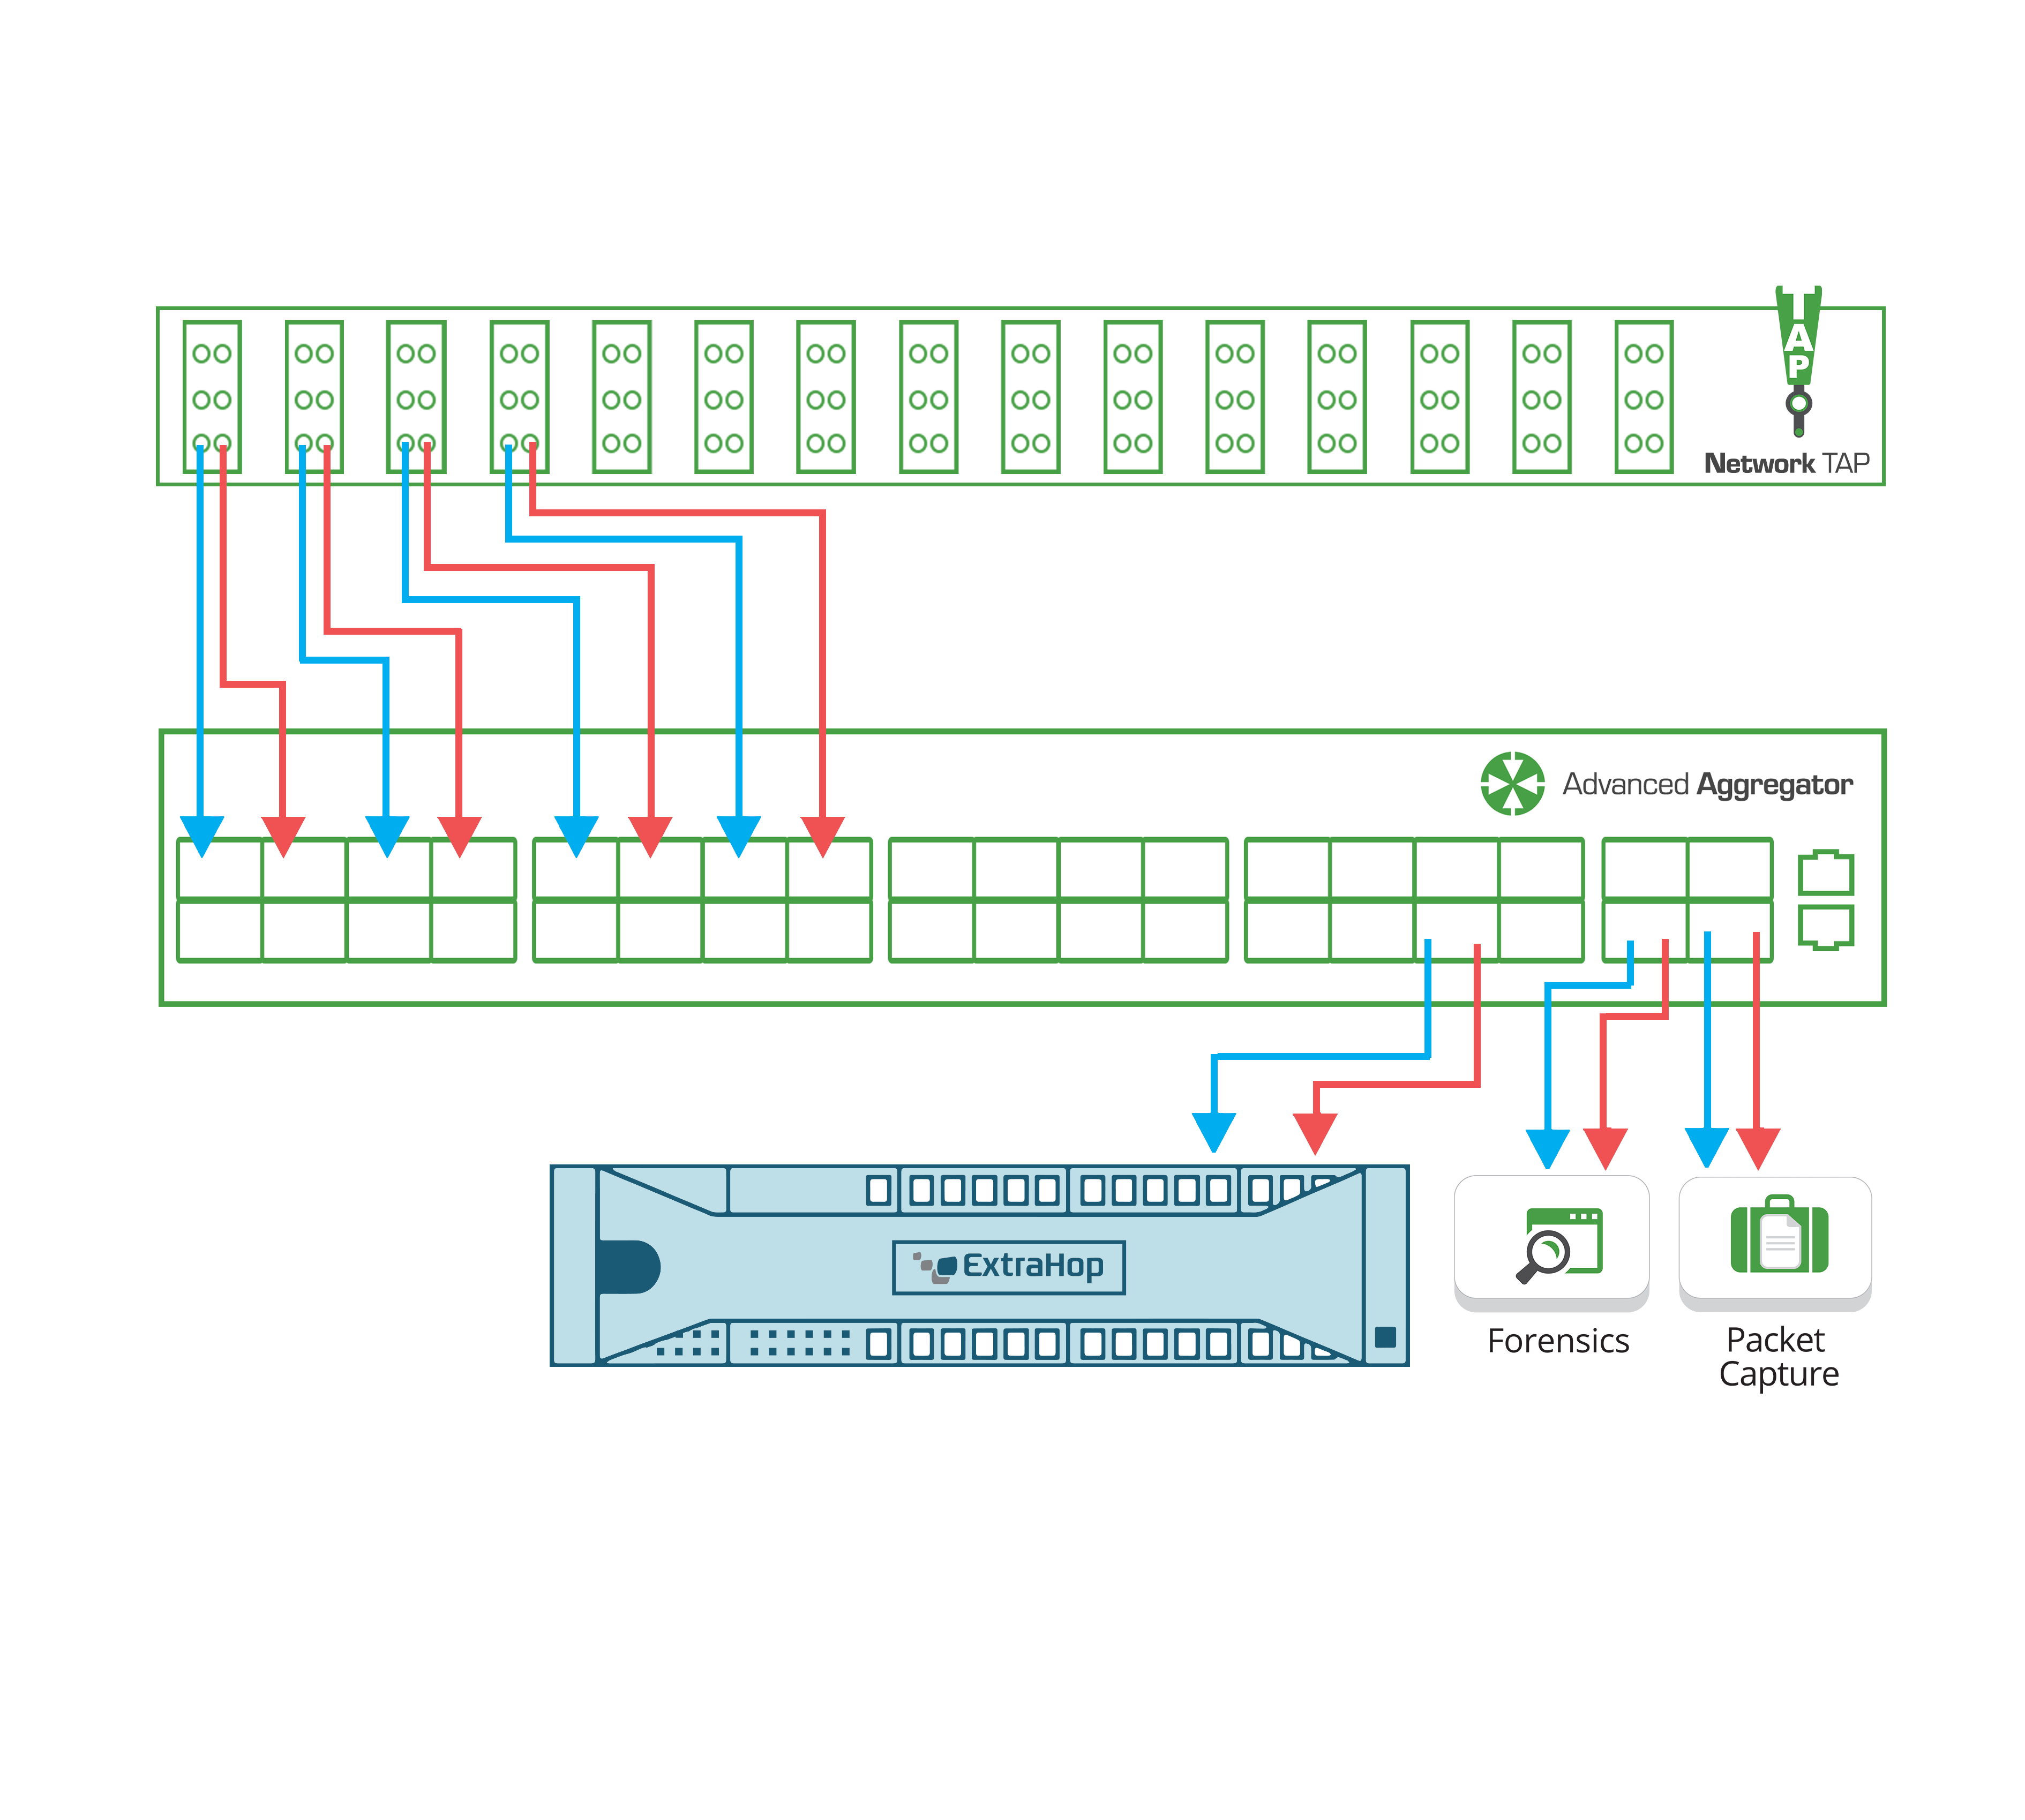 Garland Technology + ExtraHop